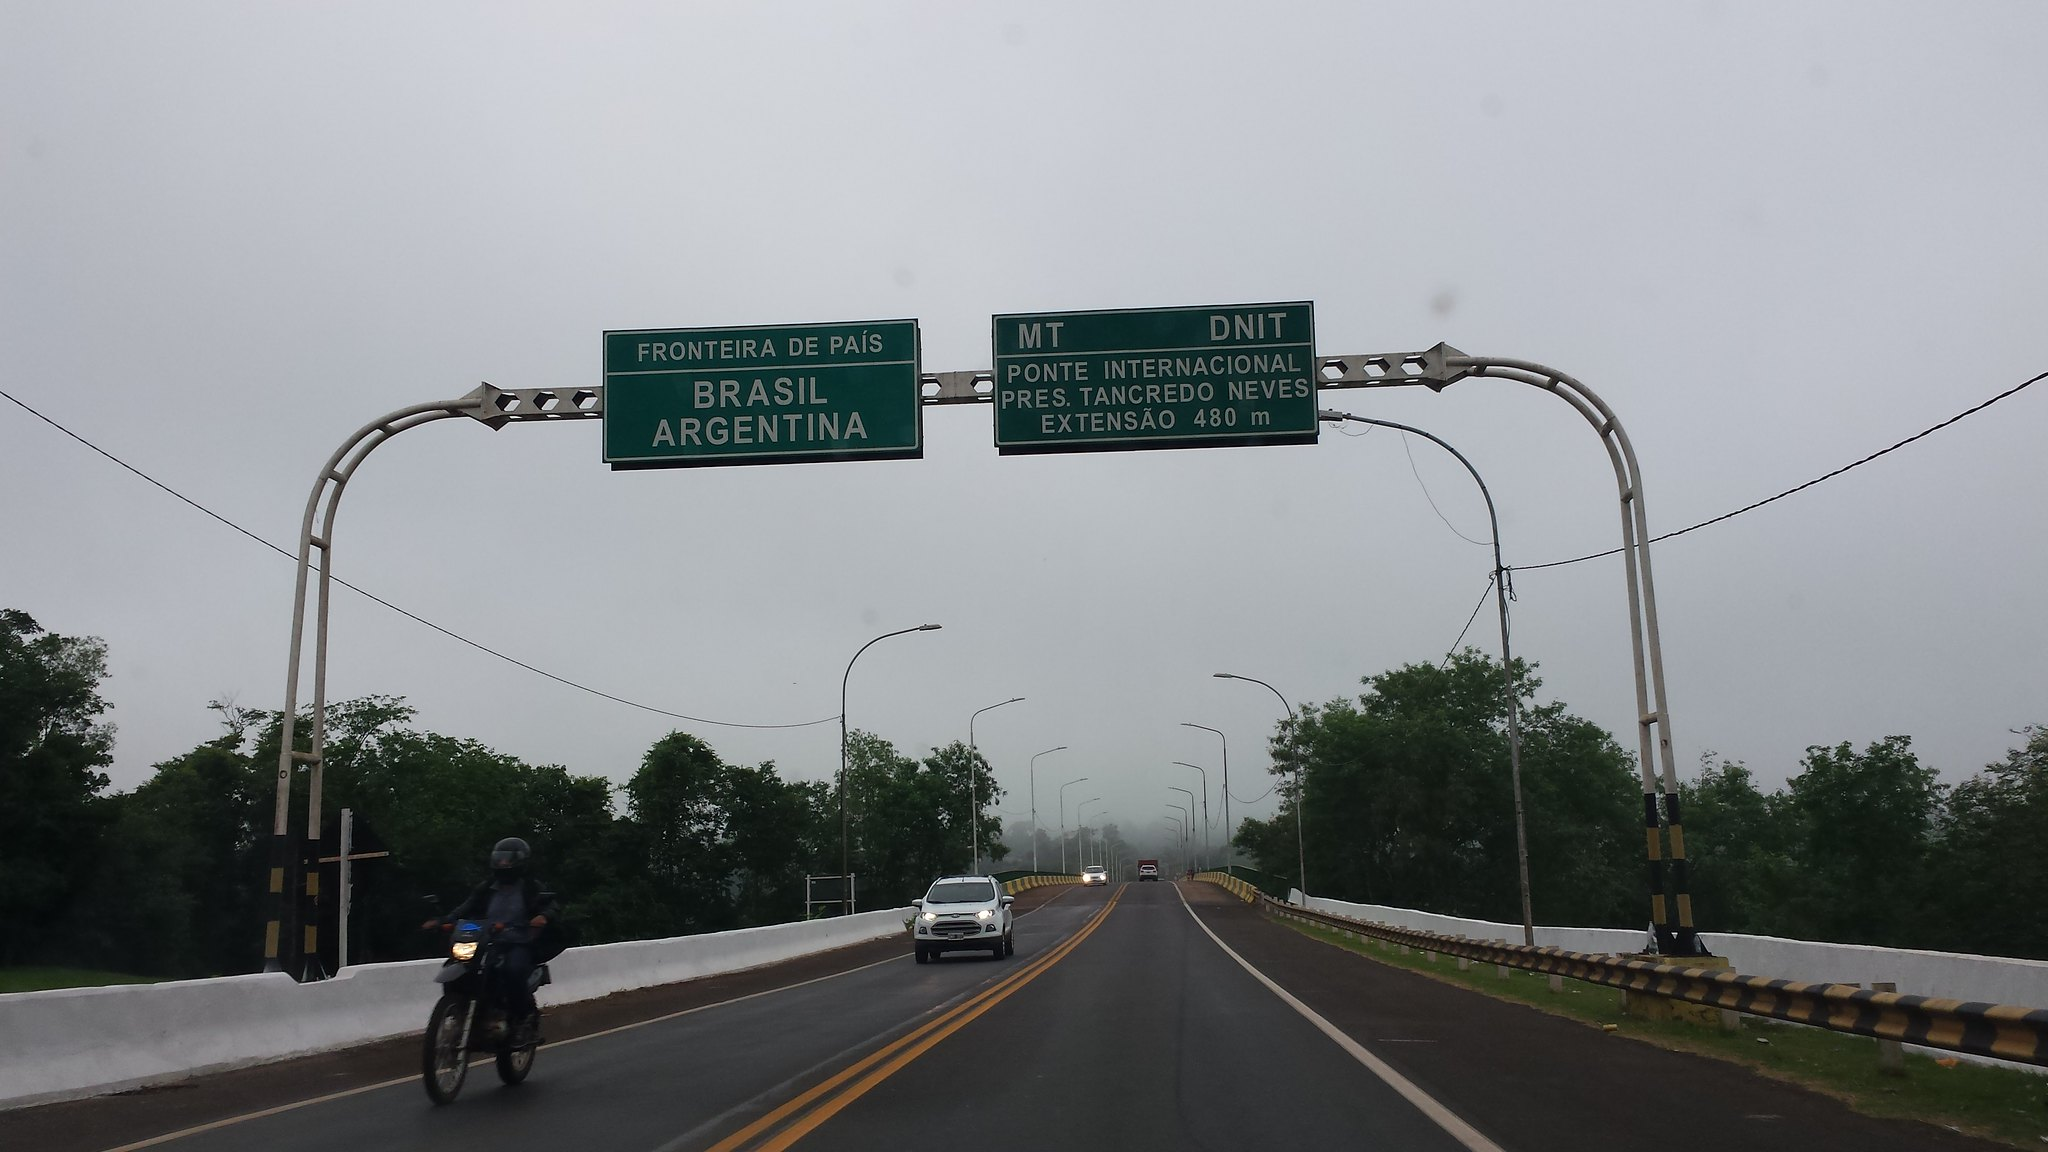 fronteira-foz-argentina1